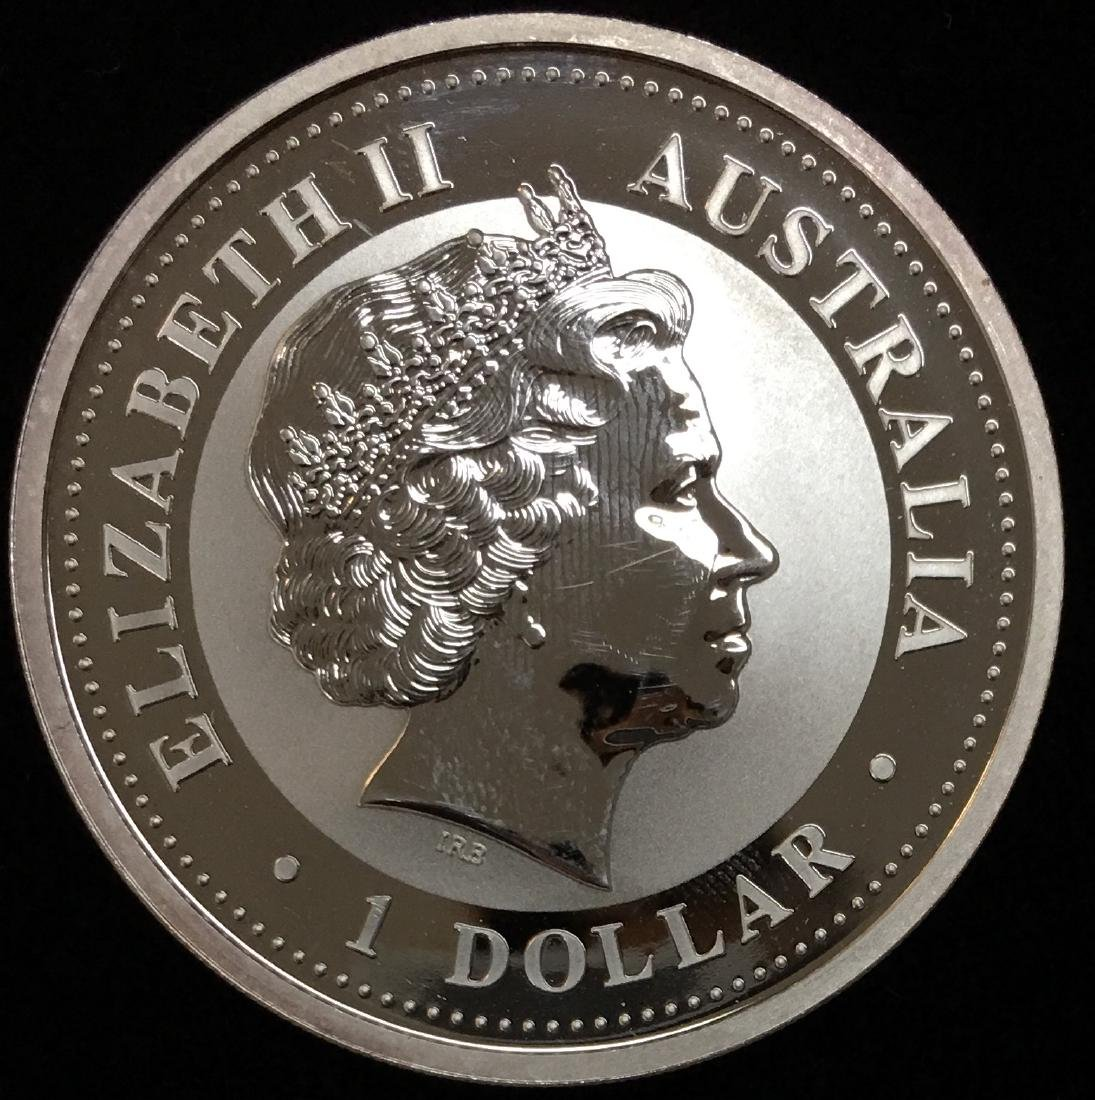 2001 $1 Australia Kookaburra 1 oz .999 Silver GBU